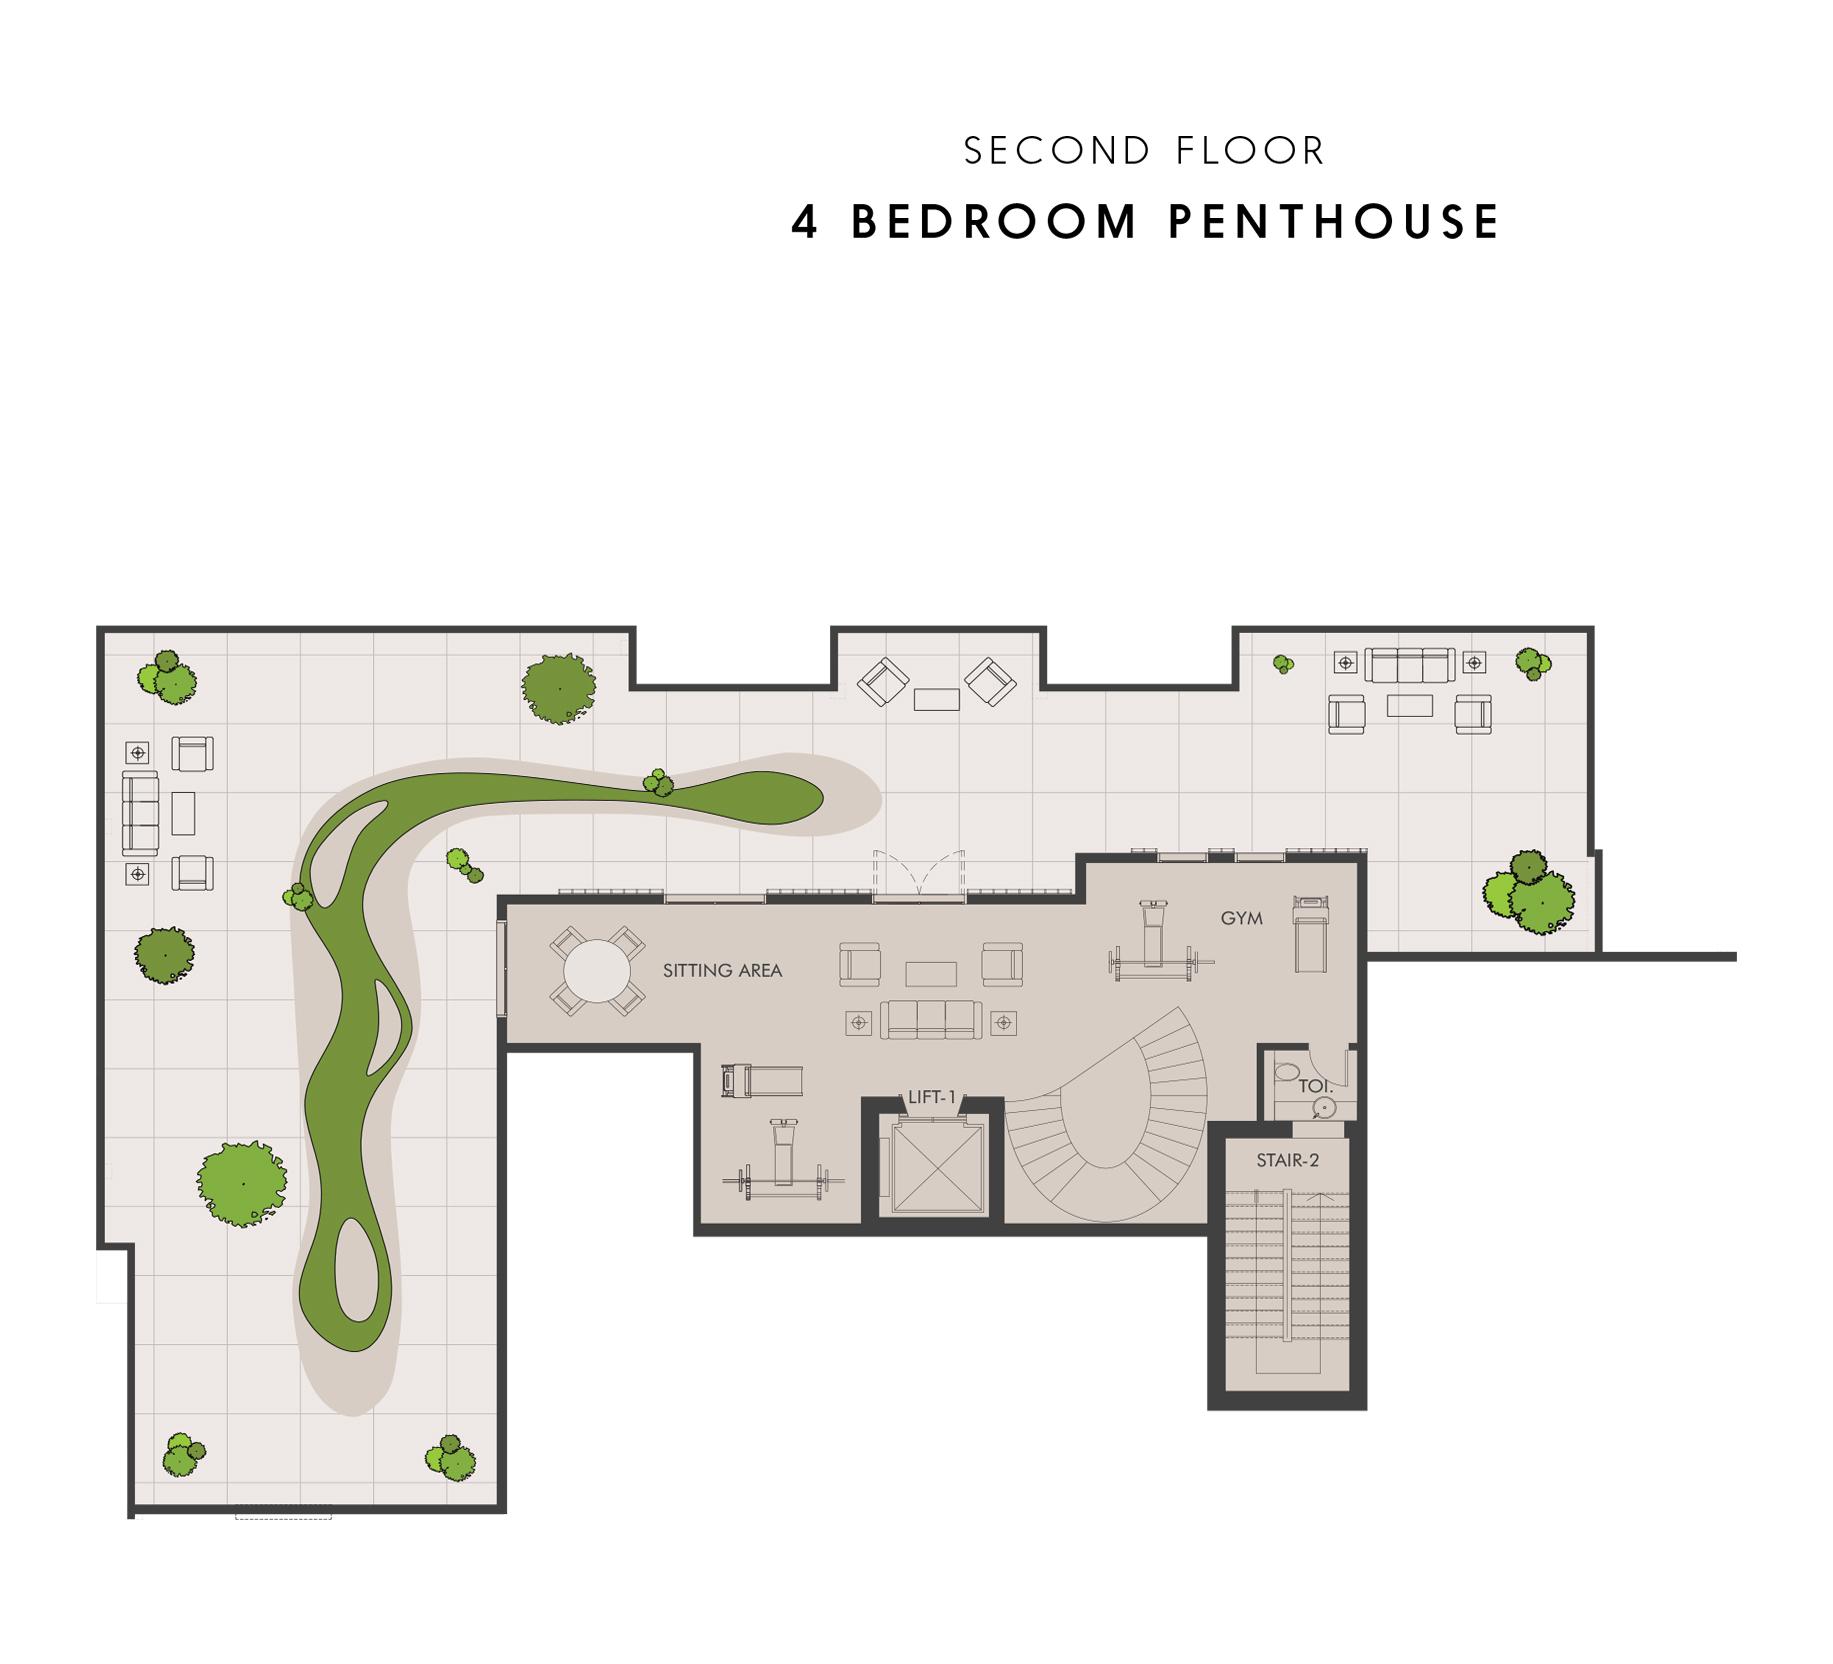 Penthouse - Second Floor